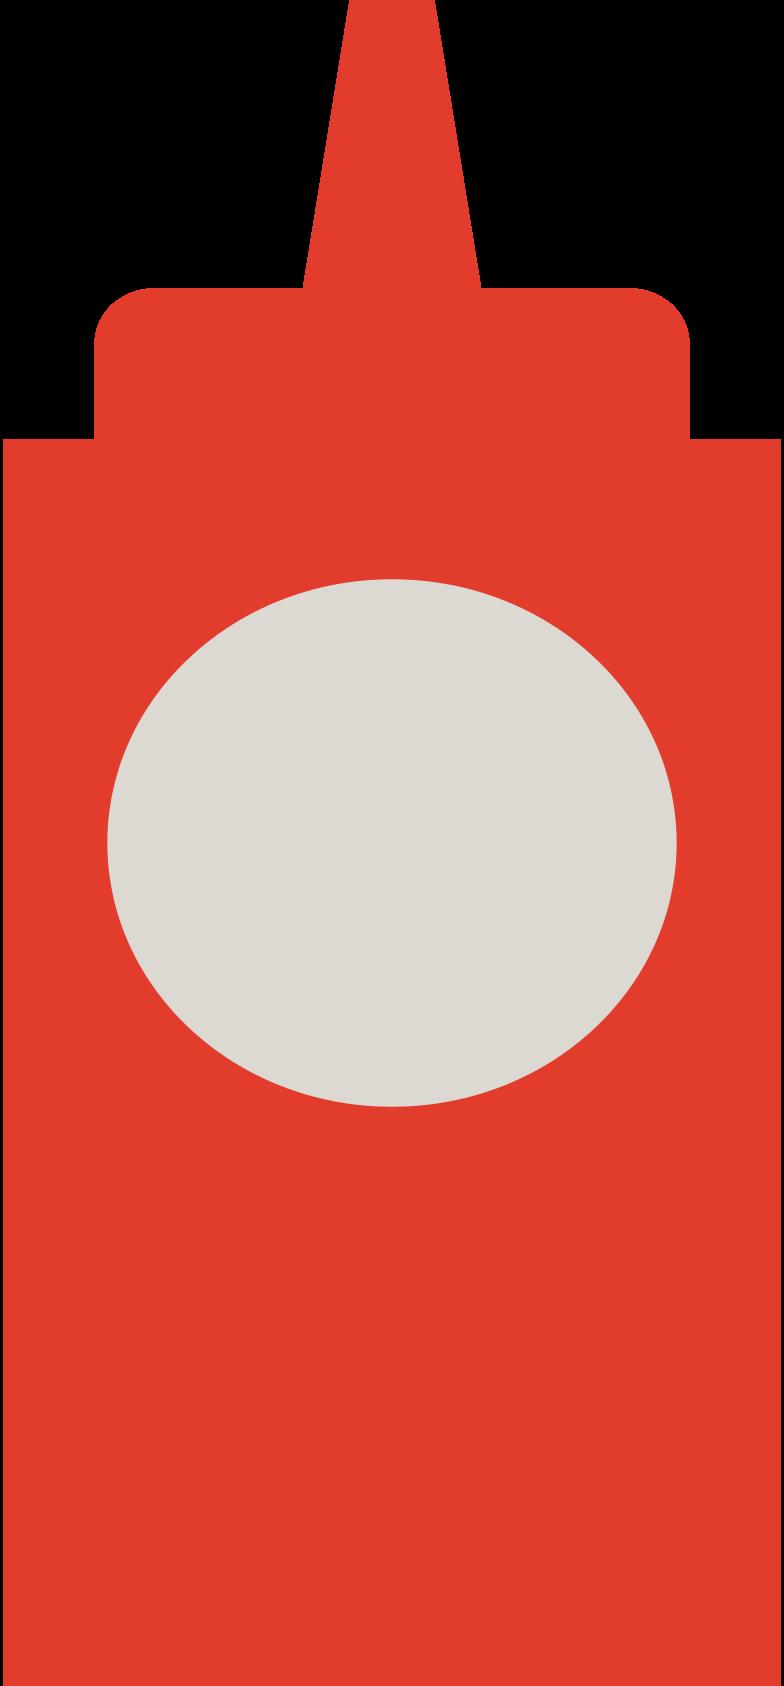 ketchup Clipart illustration in PNG, SVG